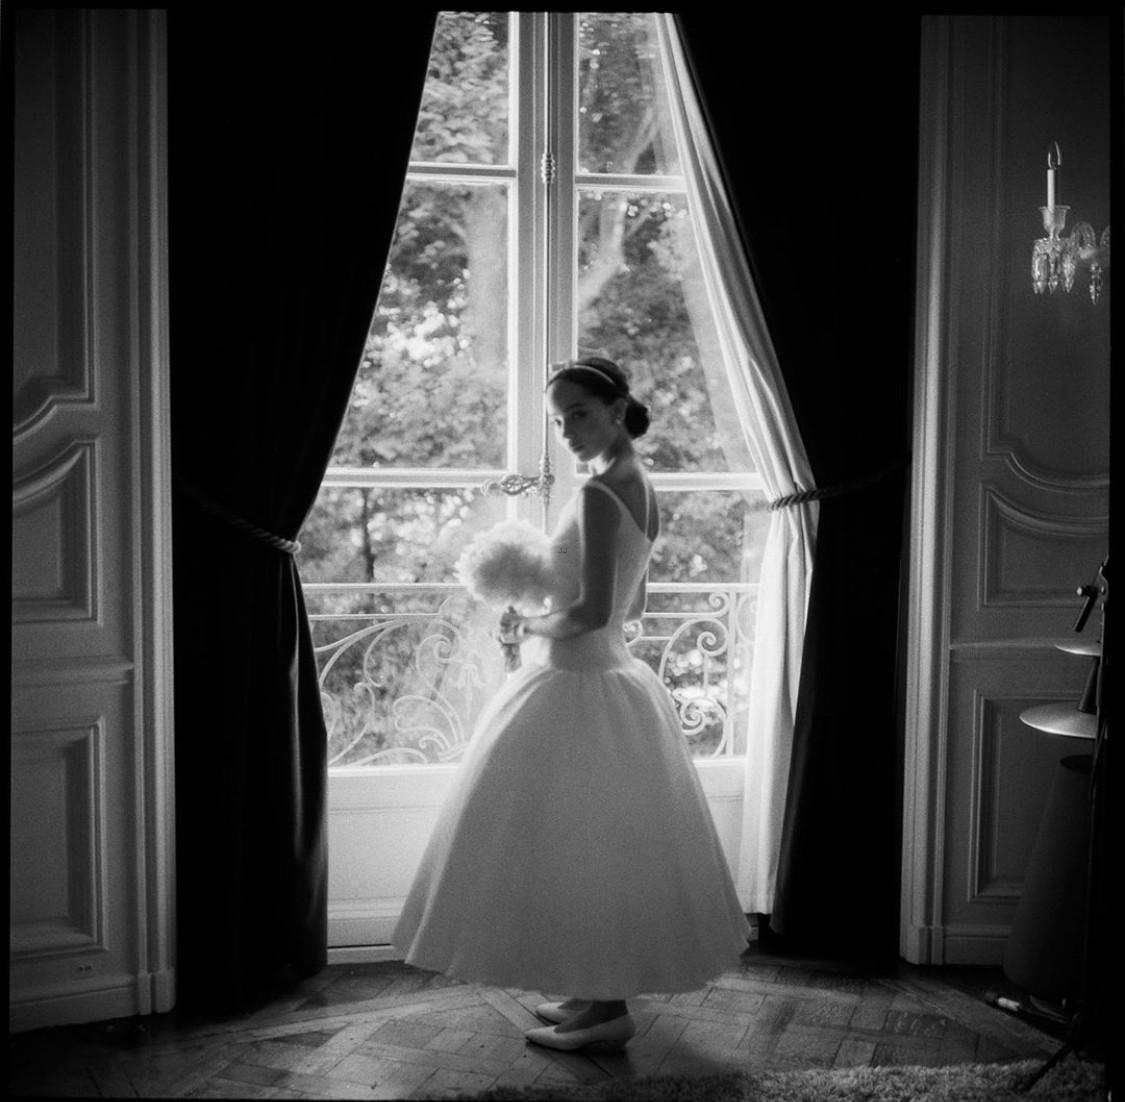 Zoe Kravitz Shares Photos From Her Paris Wedding To Karl